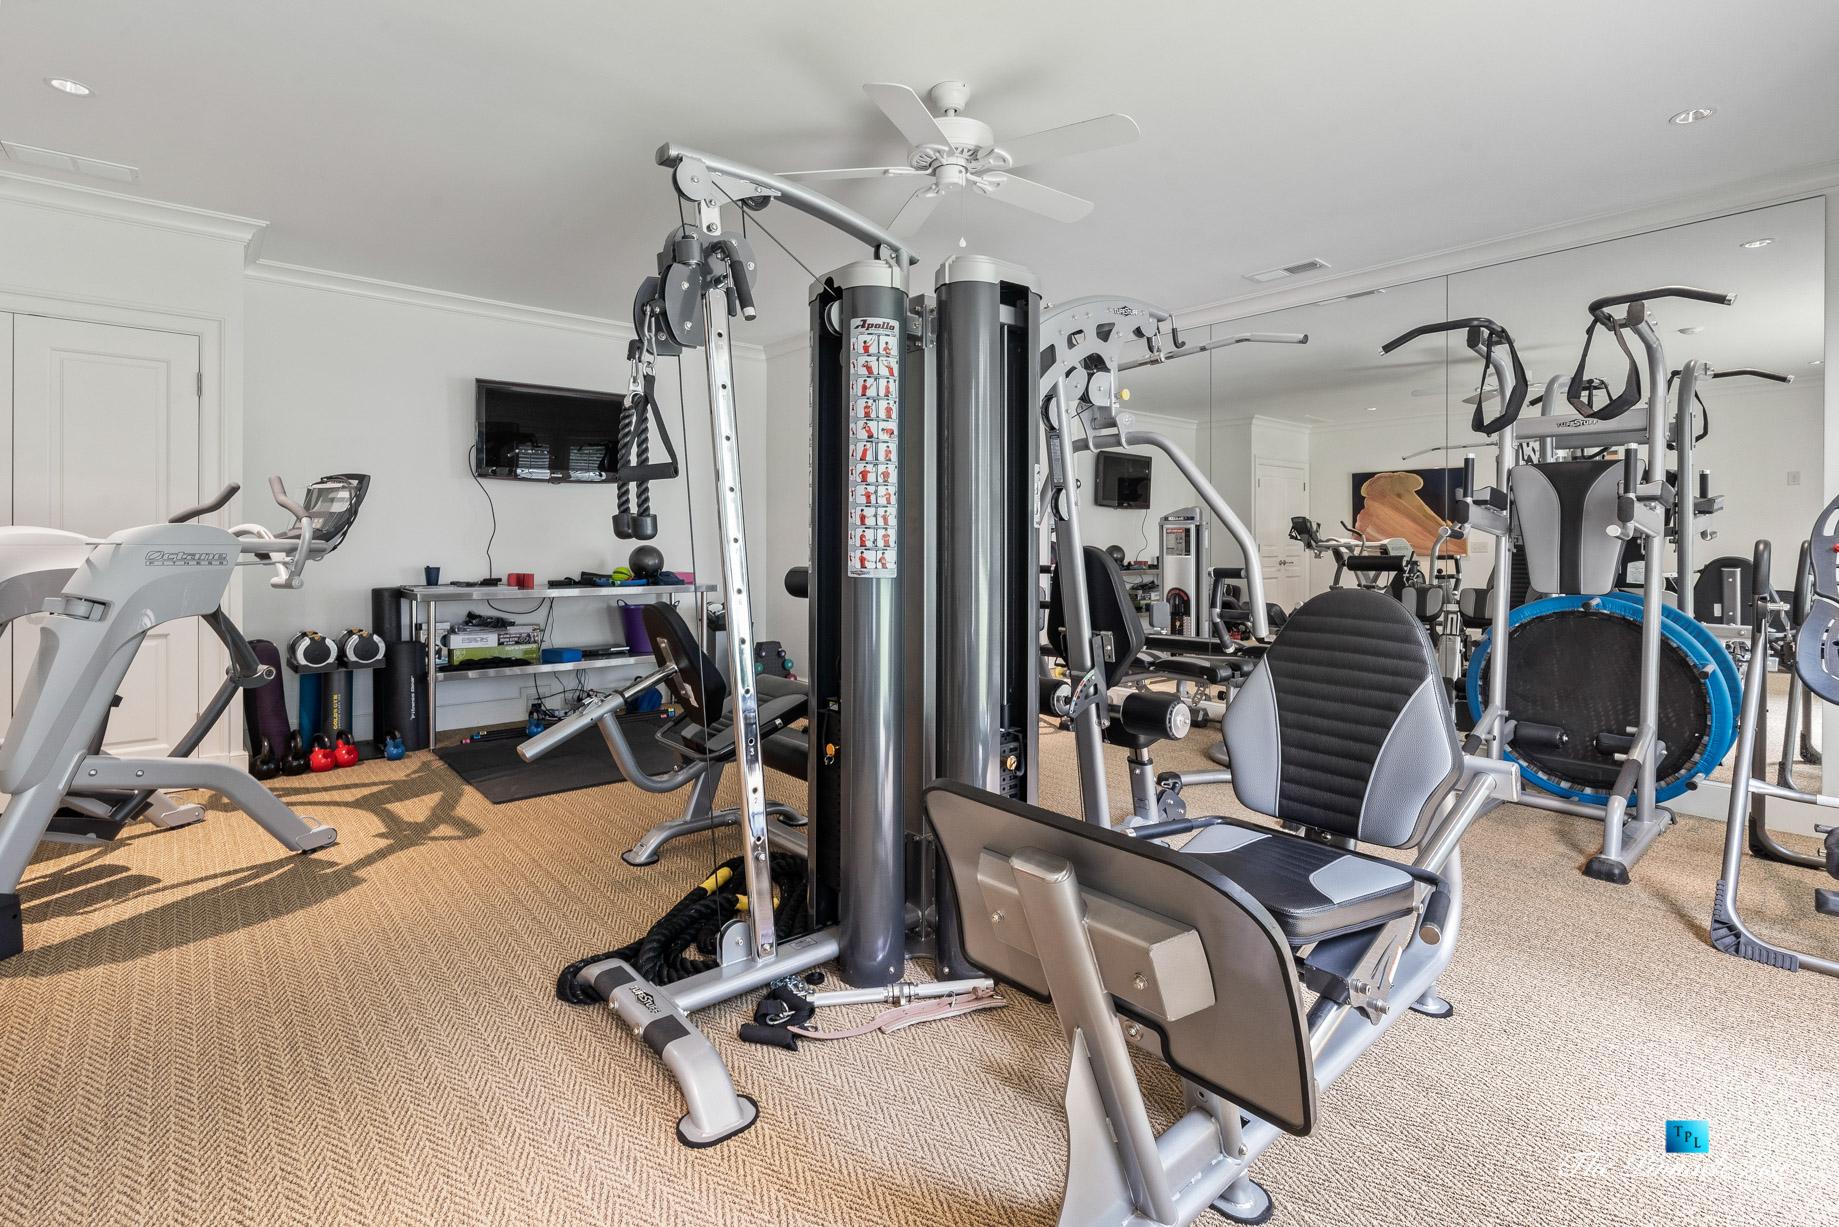 439 Blackland Rd NW, Atlanta, GA, USA - Private Gym - Luxury Real Estate - Tuxedo Park Mediterranean Mansion Home